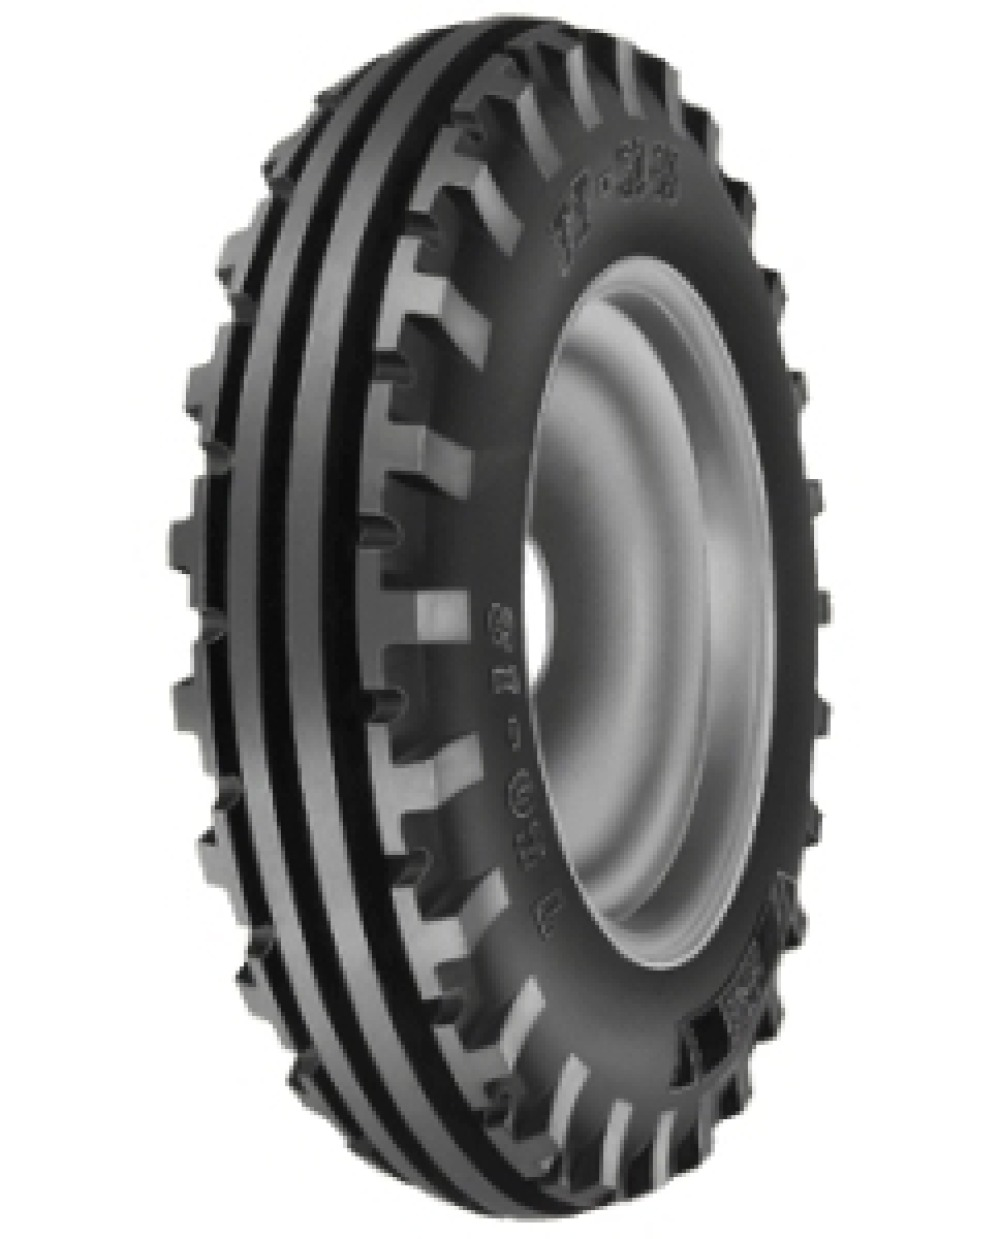 BKT 6,50 -16 6PR TF-8181 TT I.O.(Mg.abroncs)